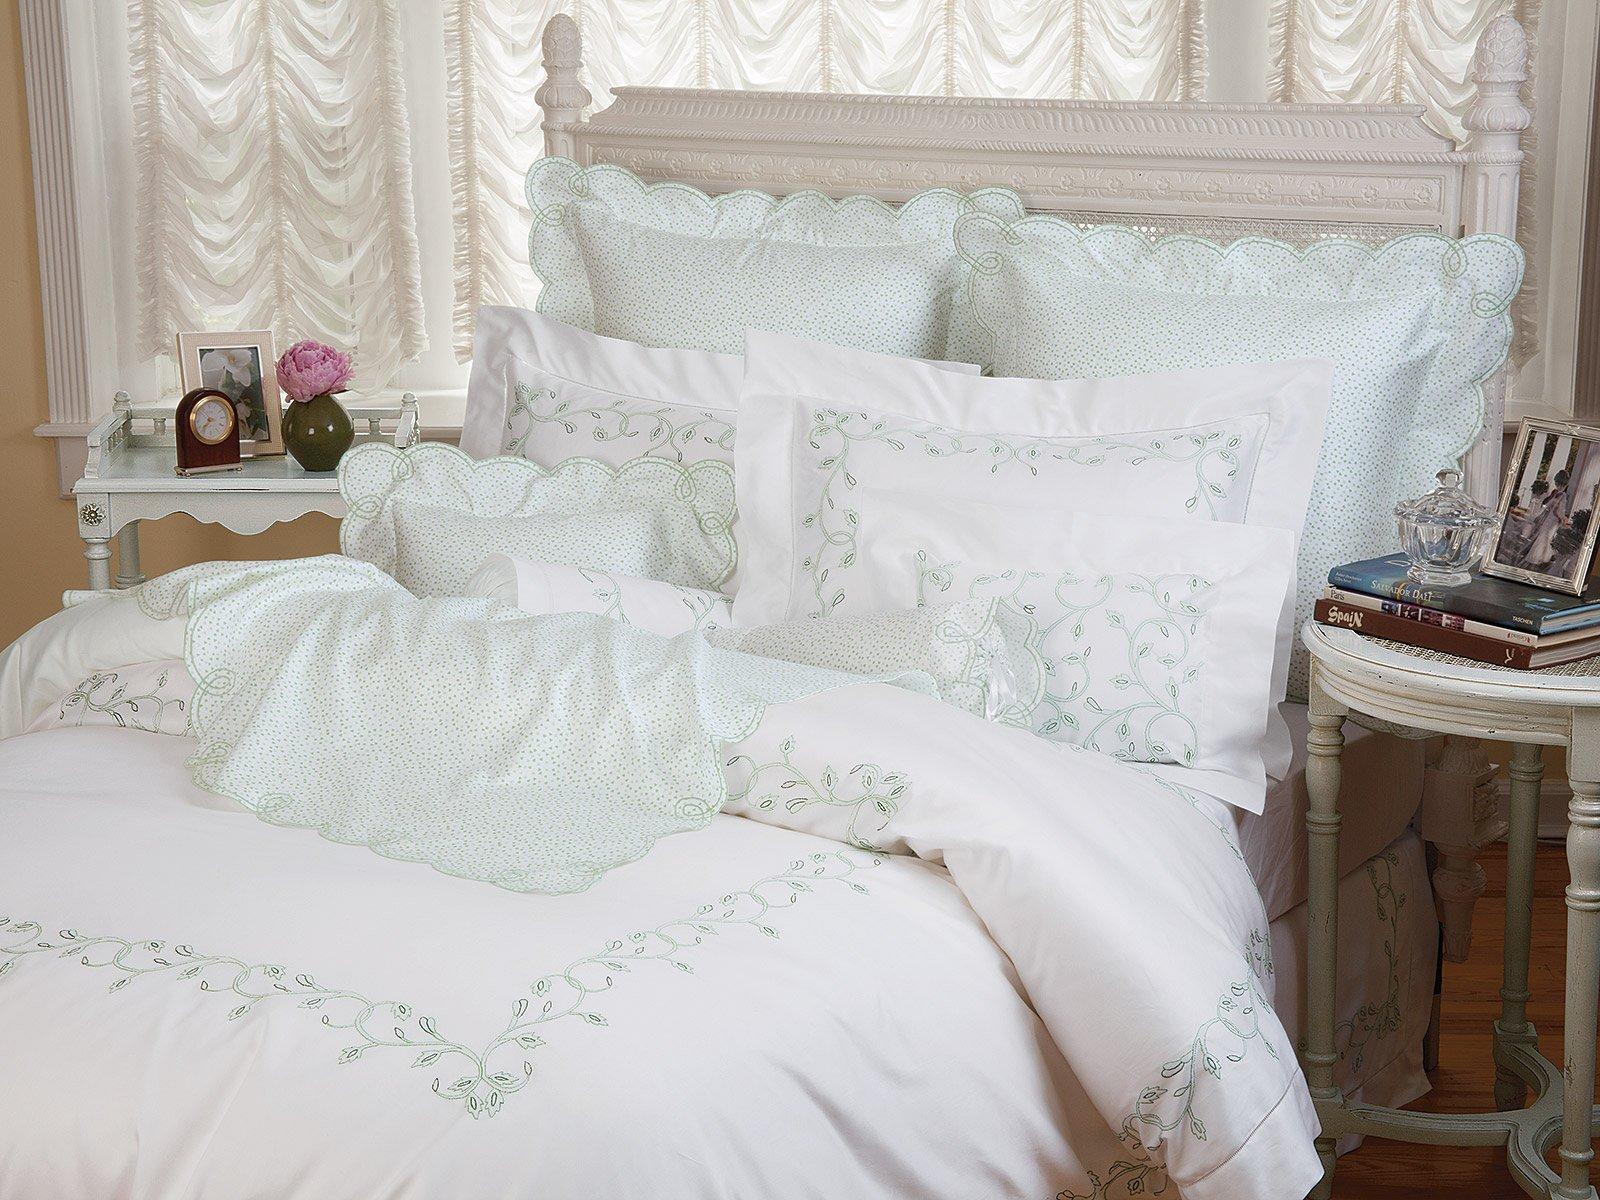 Parisienne Luxury Bedding Italian Bed Linens